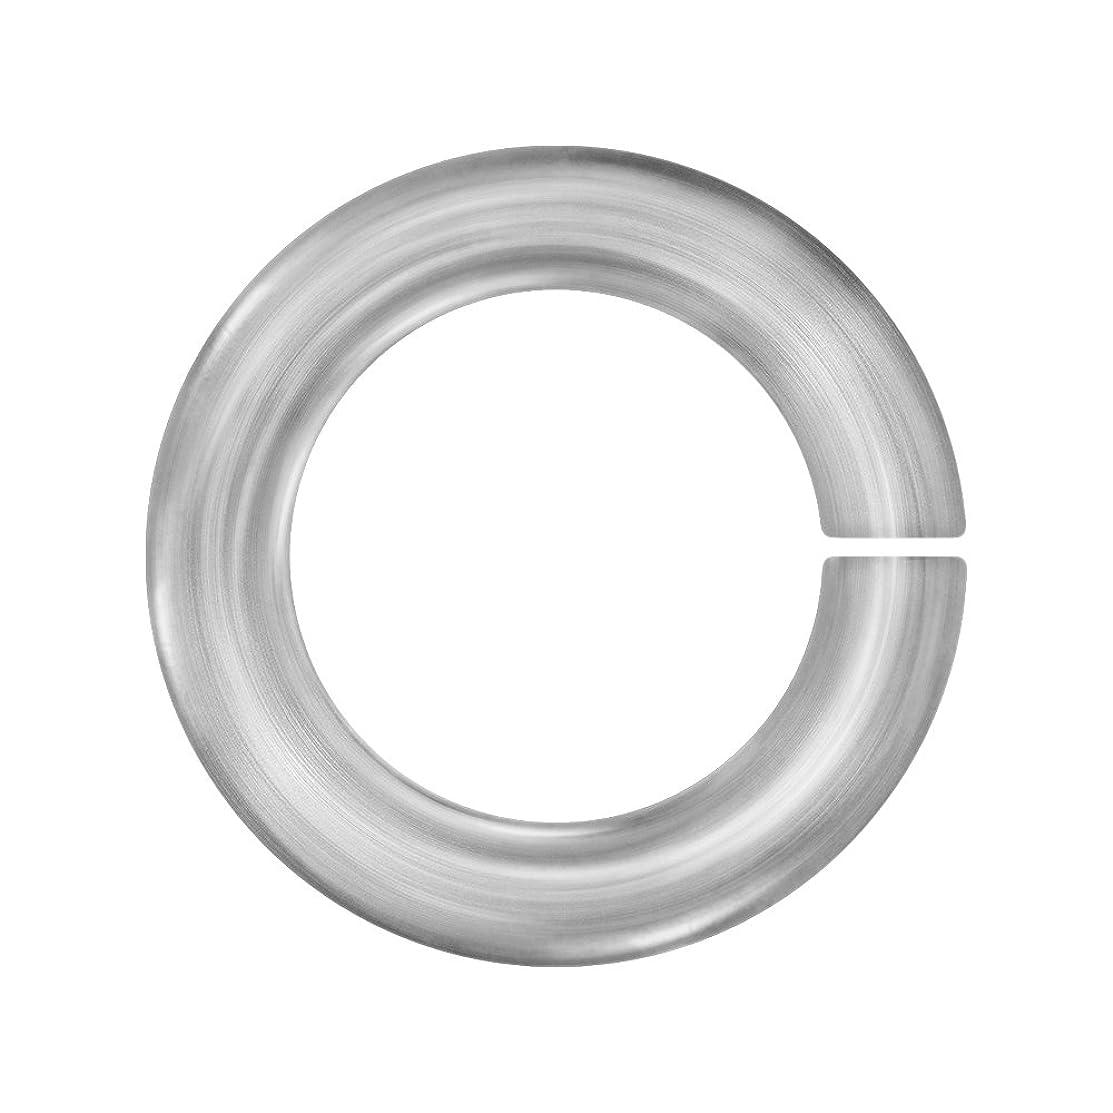 Weave Got Maille AA18A3Pltnm Gauge 3 mm Platinum Anodized Aluminum Jumprings